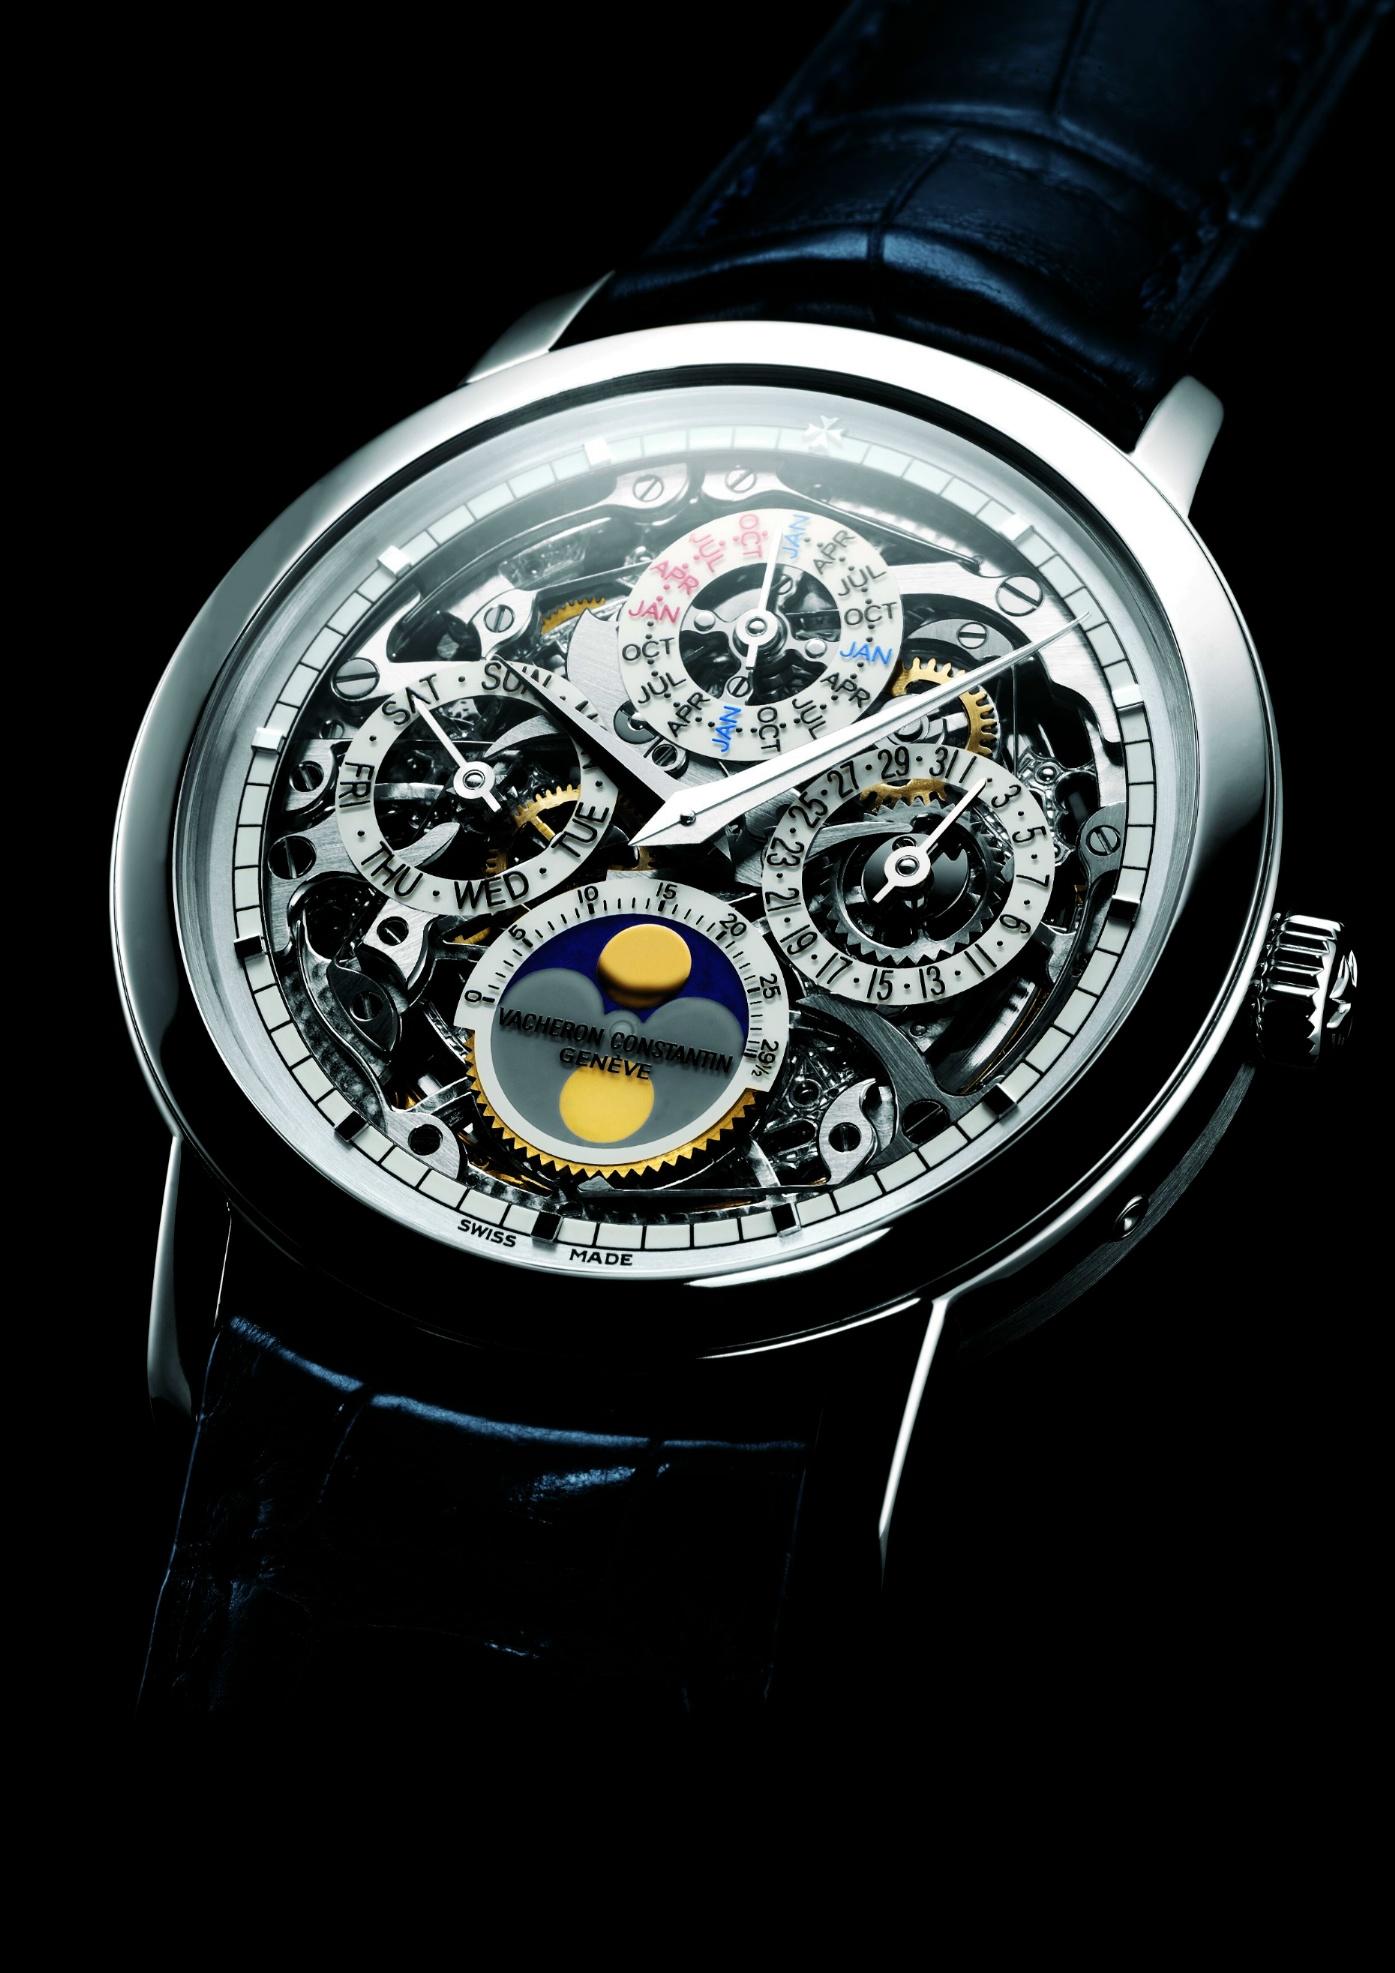 84983ae8201 TimeZone   Basel SIHH 2007 » N E W M o d e l – Vacheron Constantin  Patrimony Traditionnelle Skeleton Perpetual Calendar